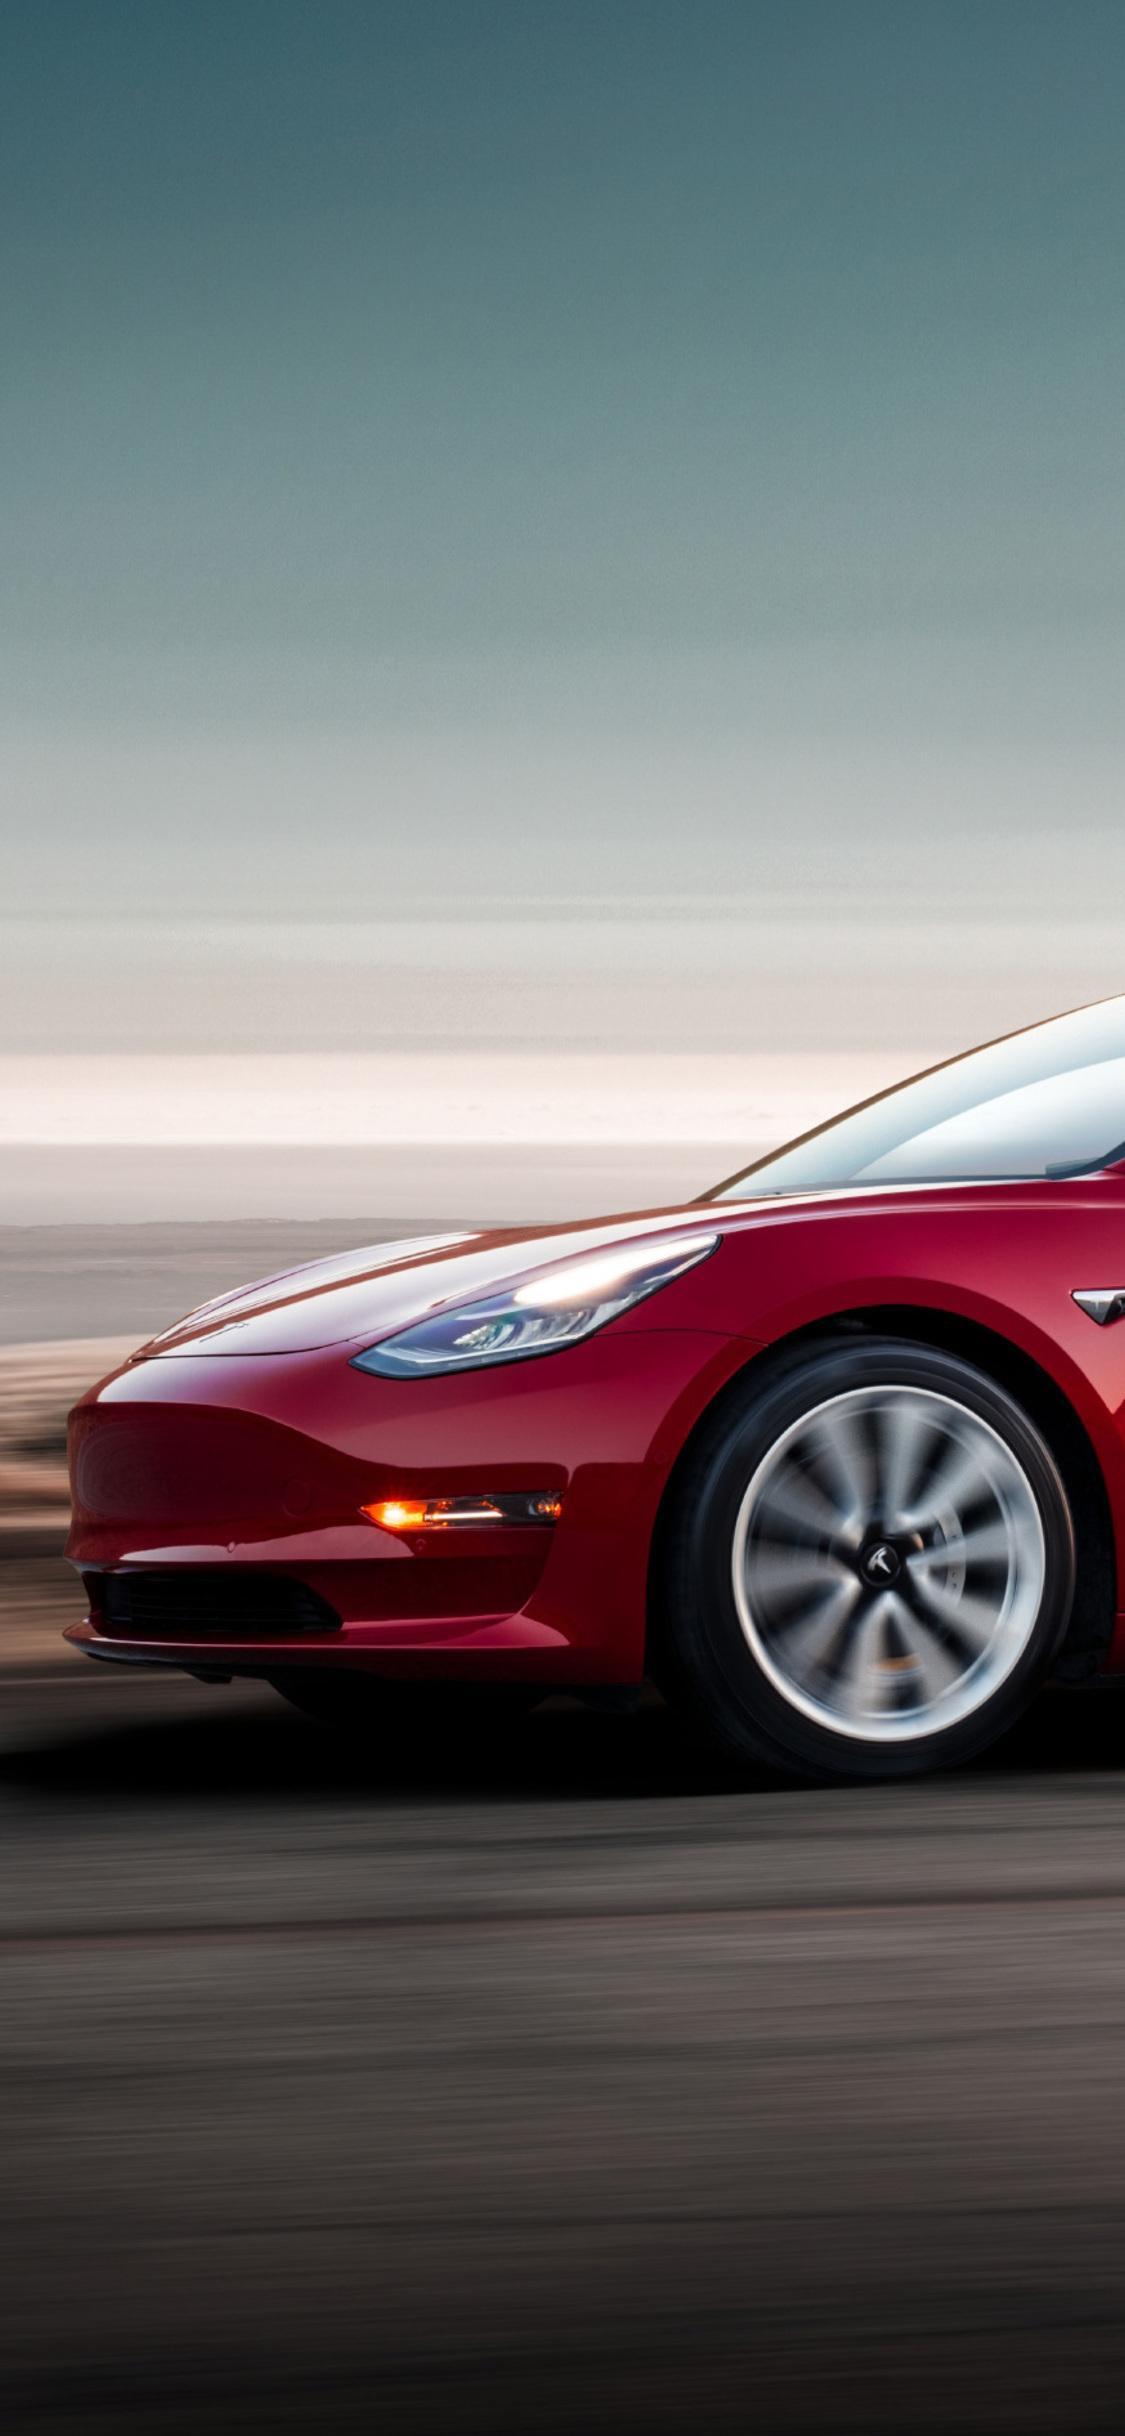 Tesla Model 3 Wallpapers - Wallpaper Cave